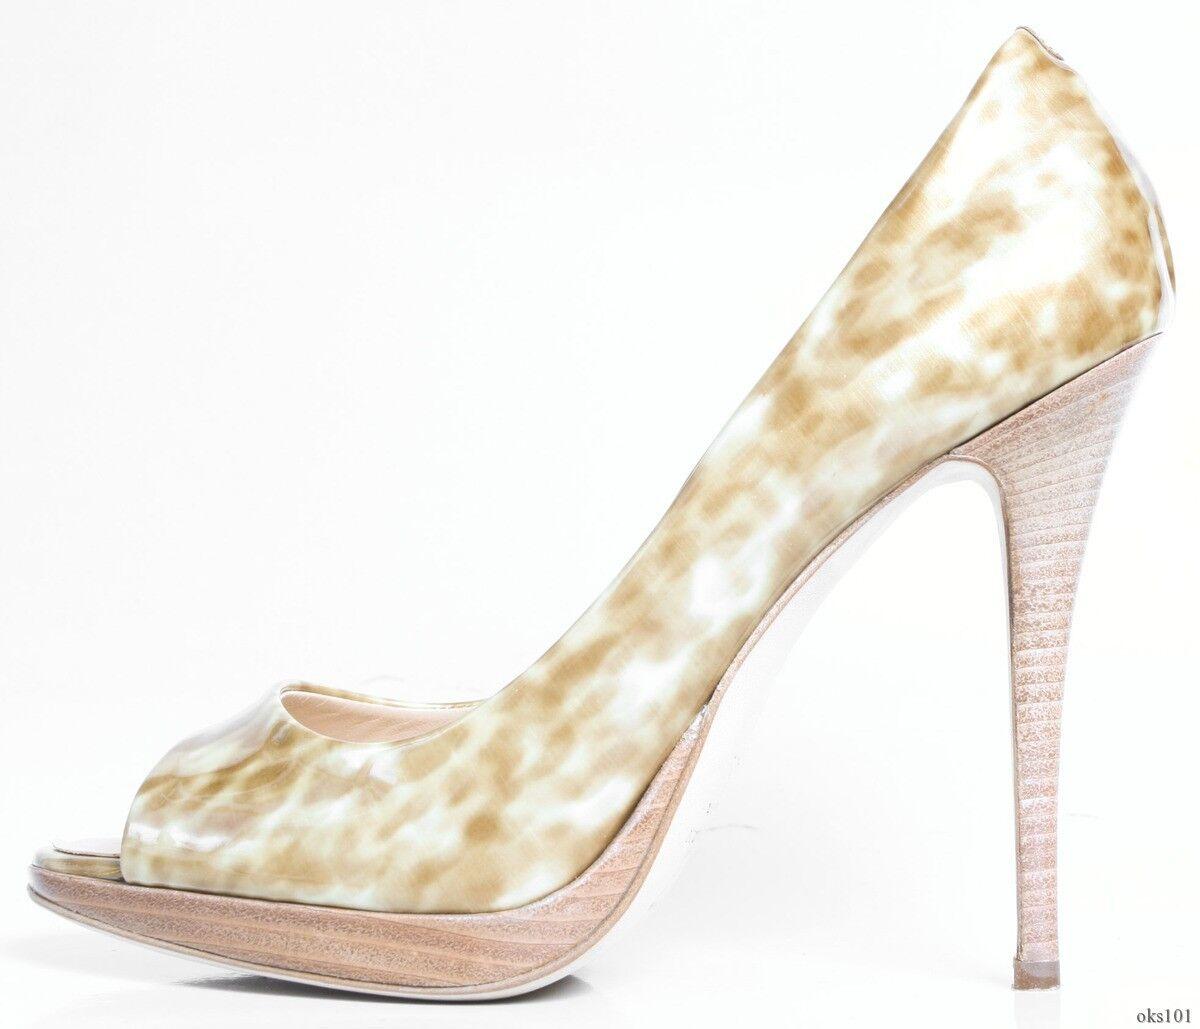 New  695 Giuseppe ZANOTTI tortoise patent open-toe platform shoes 40.5 10.5 SEXY